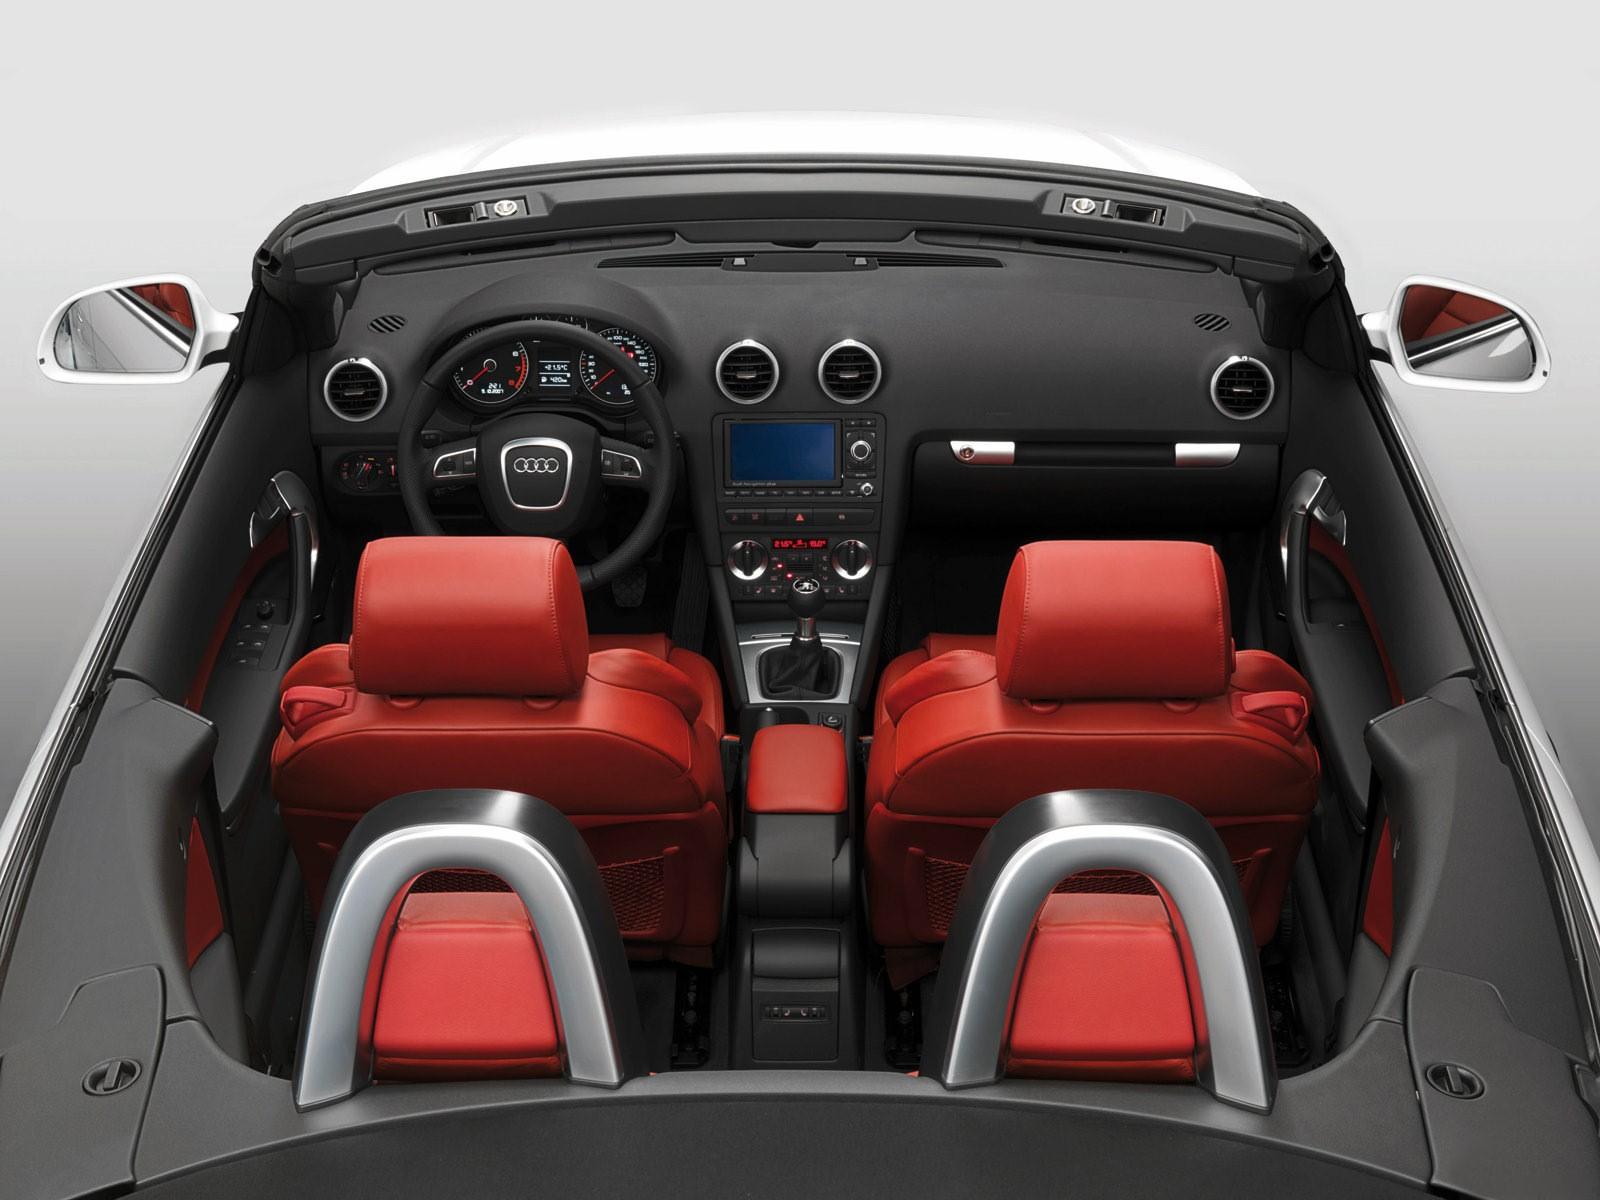 Audi a3 cabriolet specs 2008 2009 2010 2011 2012 2013 audi a3 cabriolet 2008 2013 sciox Images